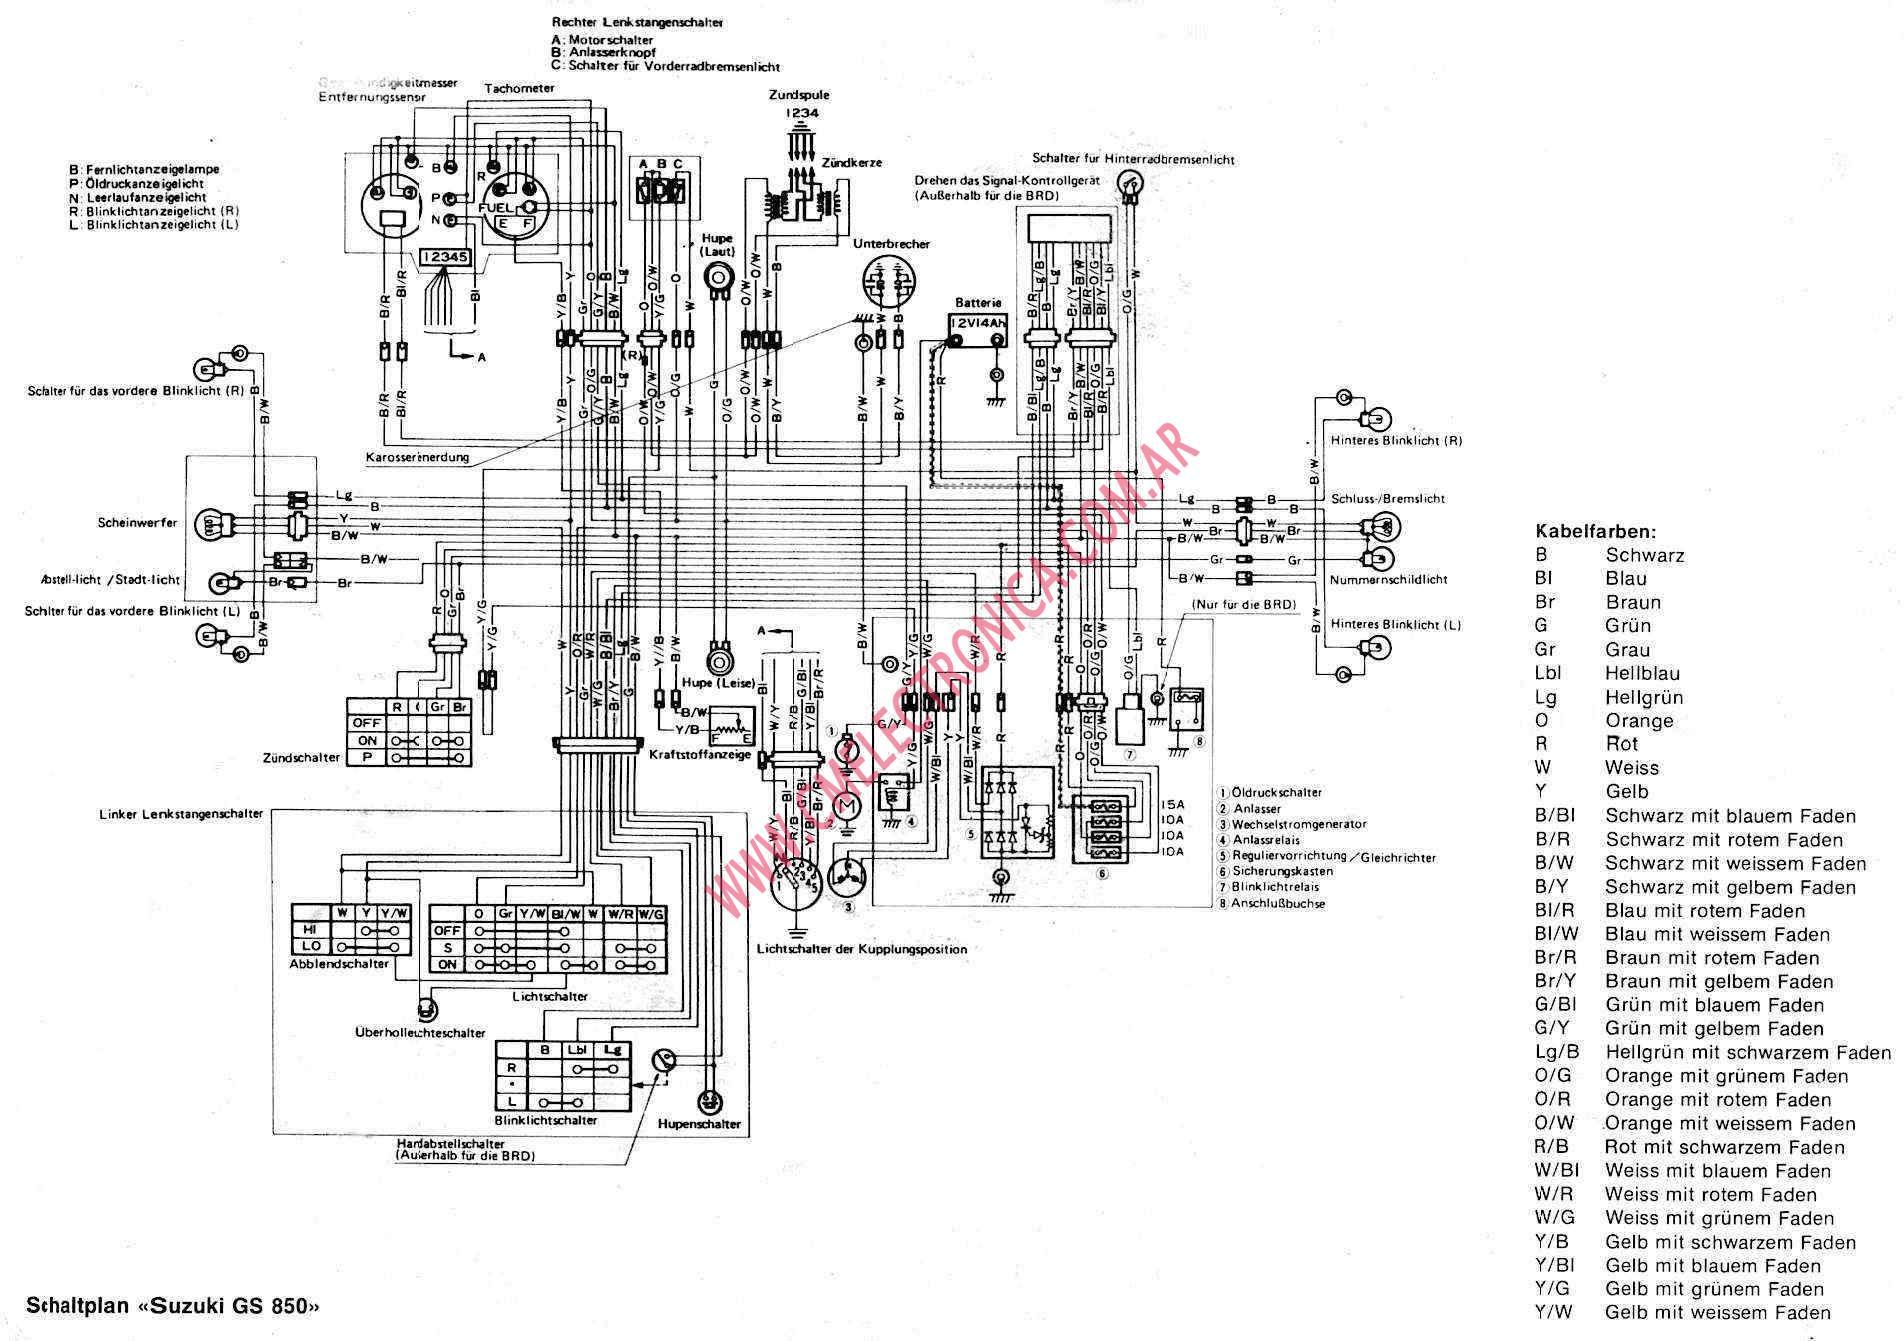 simple wiring diagram for harley's 1982 suzuki gs 650 gl wiring diagram 1982 suzuki gs 1100